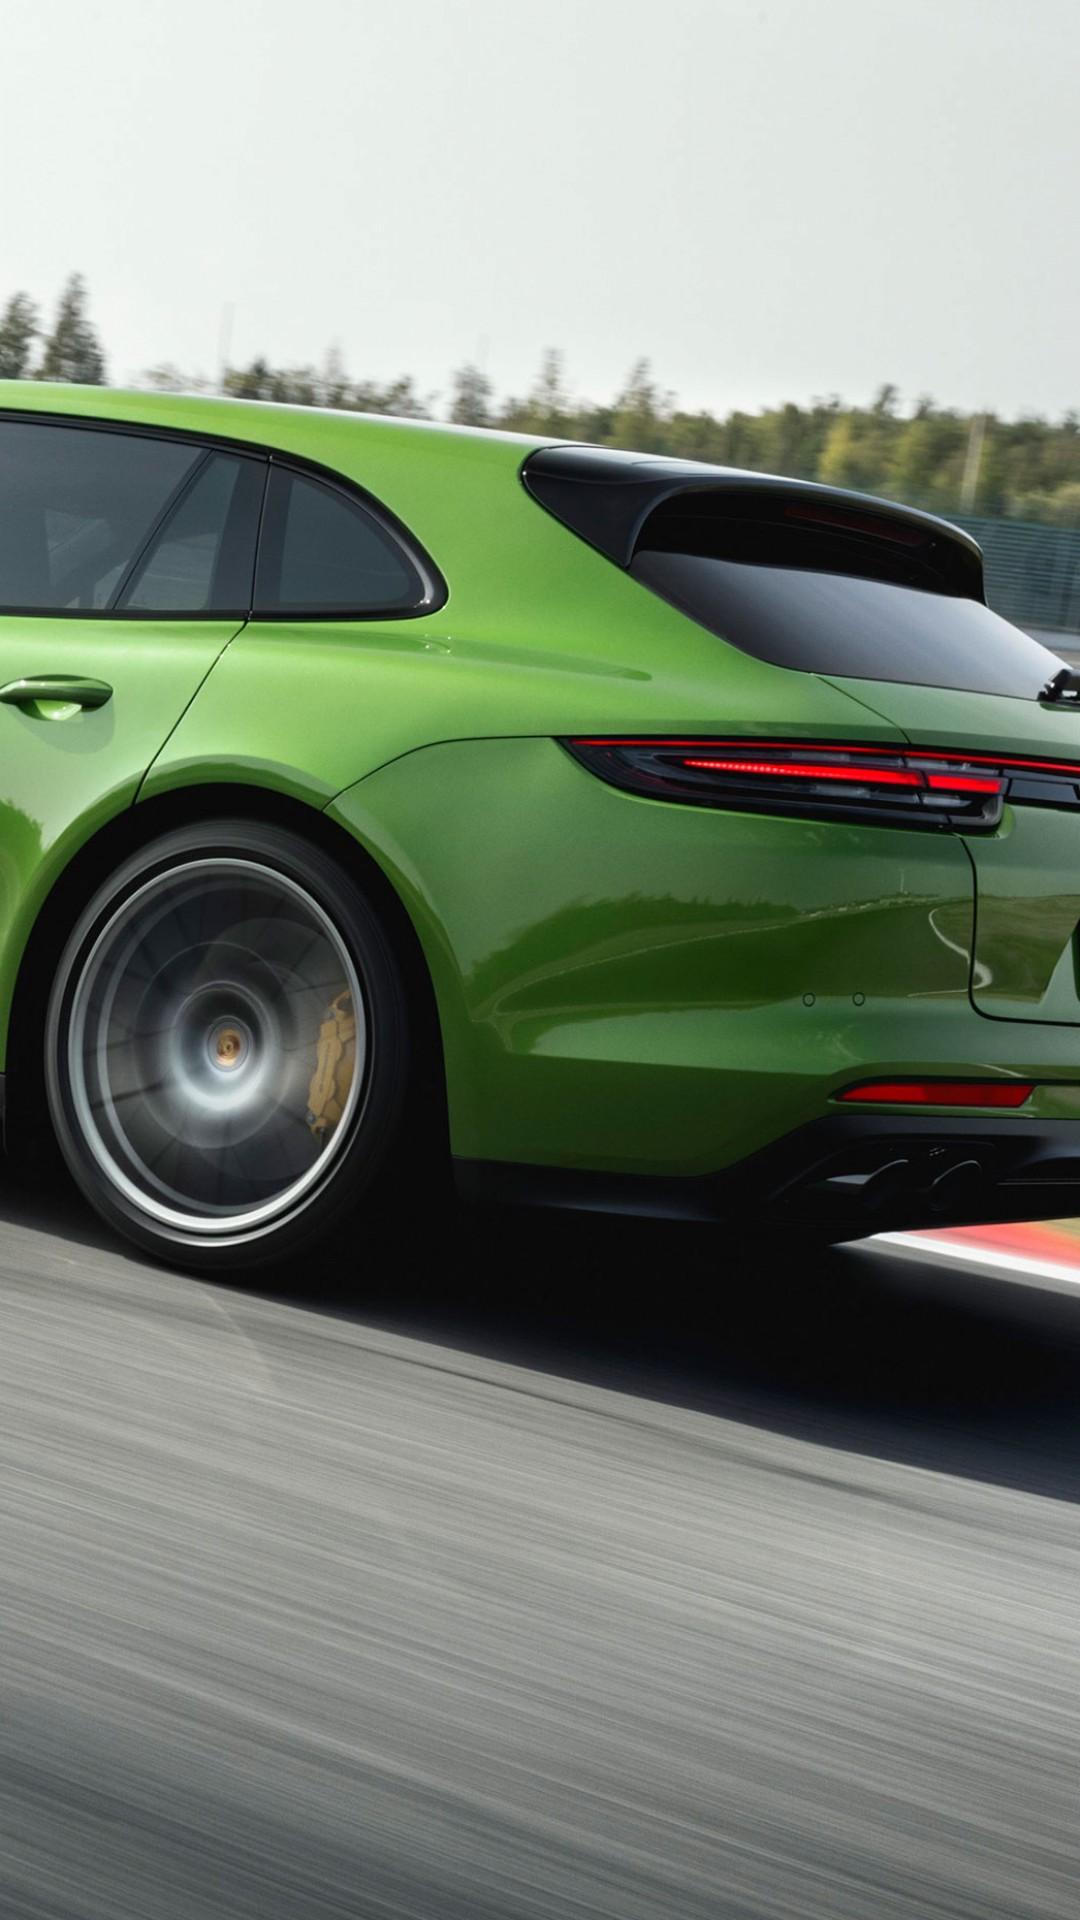 2019 Jaguar Xe >> Wallpaper Porsche Panamera Sport Turismo GTS, 2019 Cars, 4K, Cars & Bikes #20718